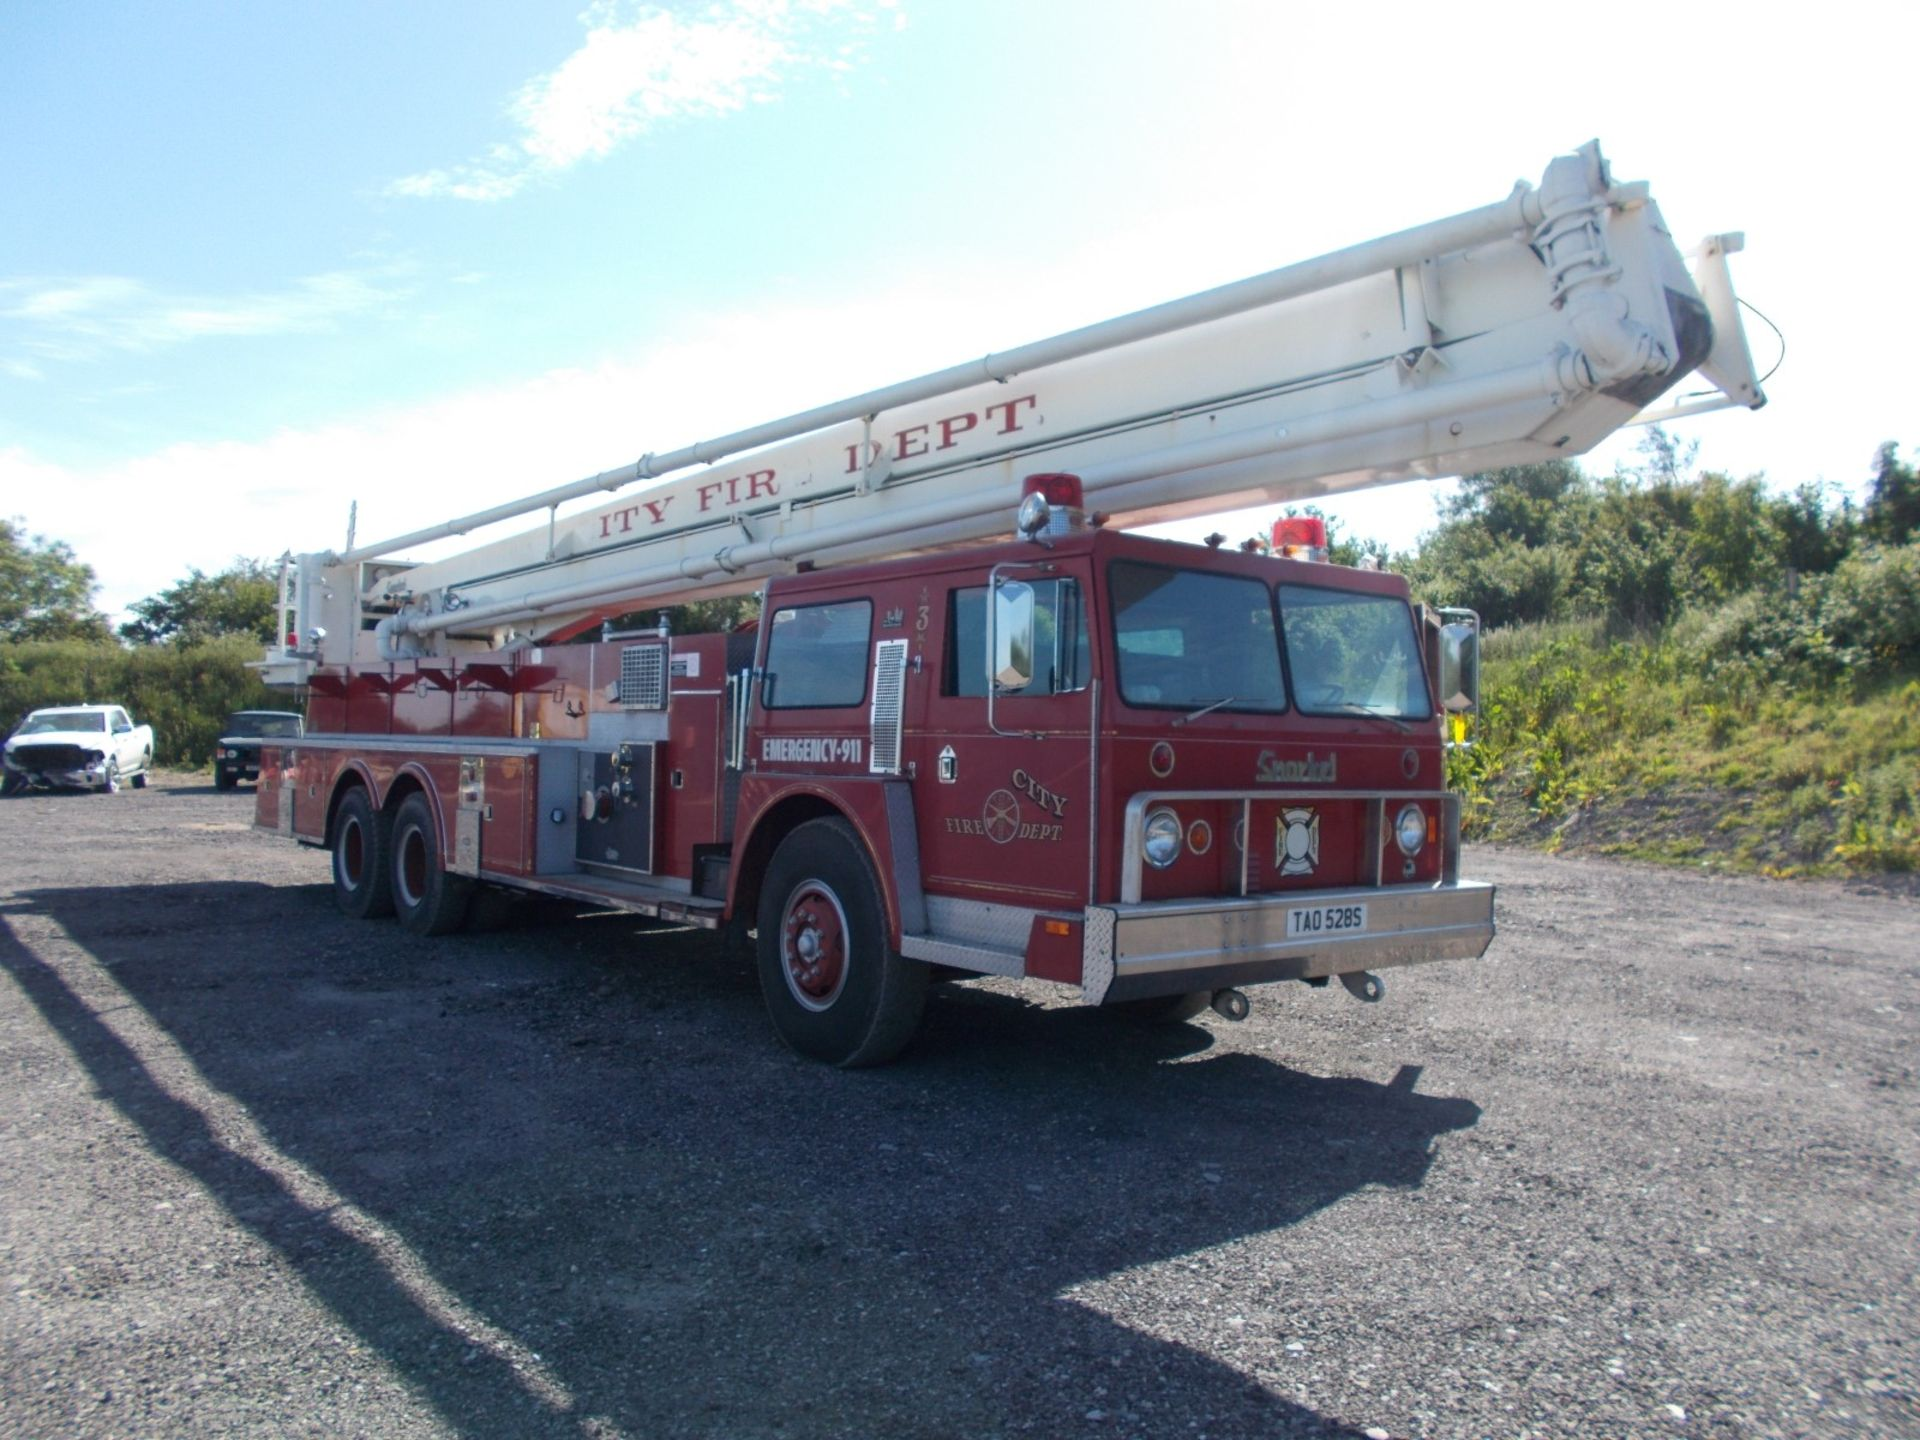 1978 HENDRICKSON 871-LPS SNORKEL FIRE TRUCK, U.S. IMPORT, 7.0 LITRE DETROIT DIESEL ENGINE *PLUS VAT* - Image 7 of 22